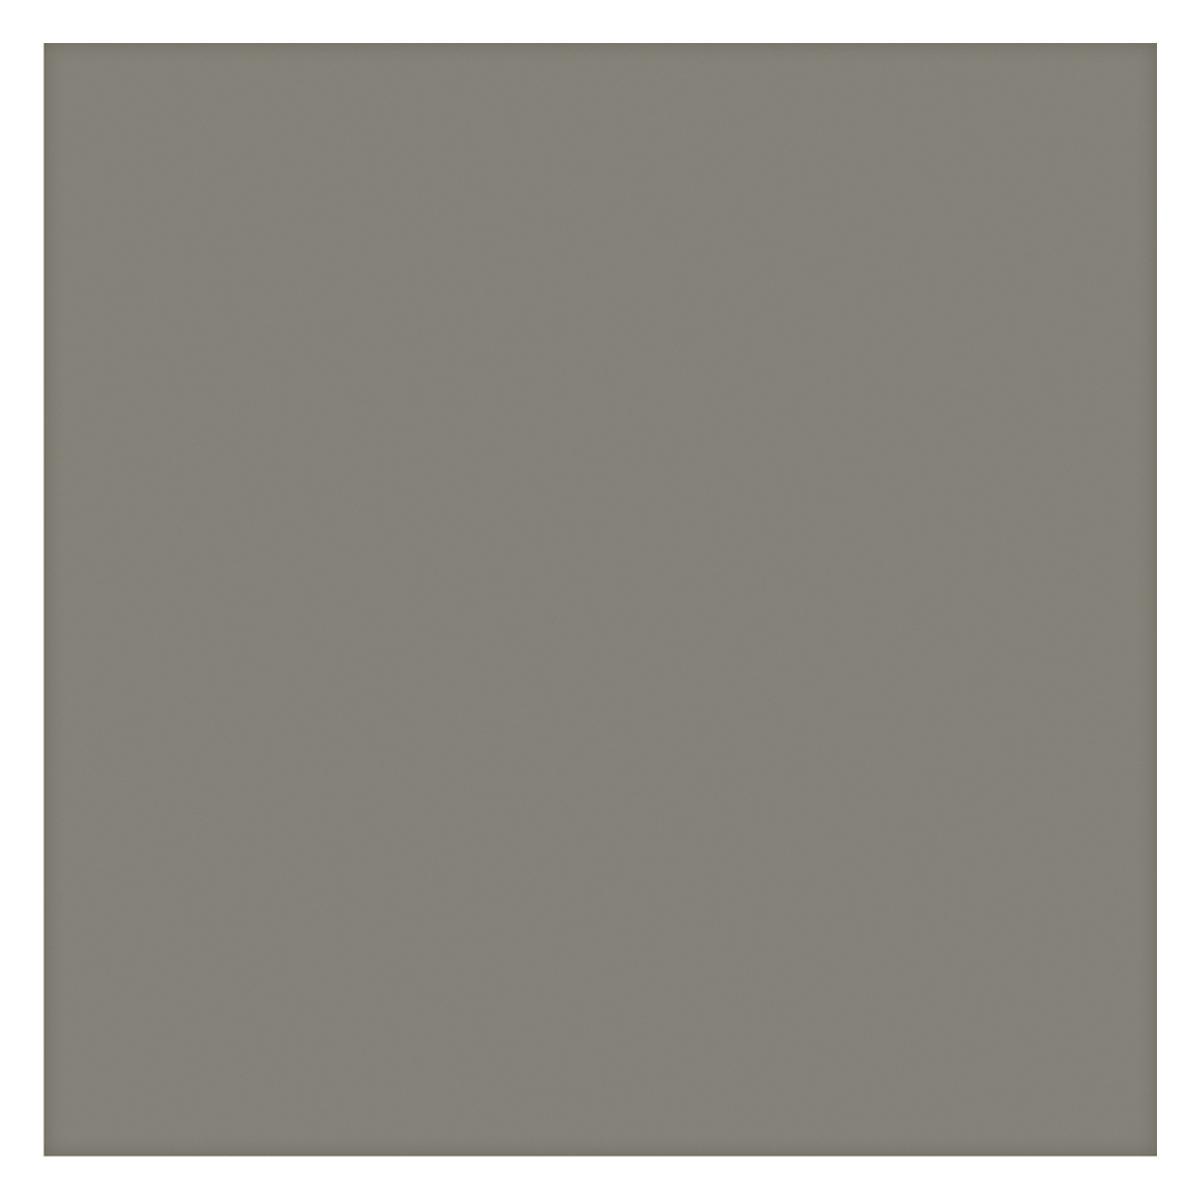 Porcelanato Gris Brillante - 60X60 cm - 1.44 m2